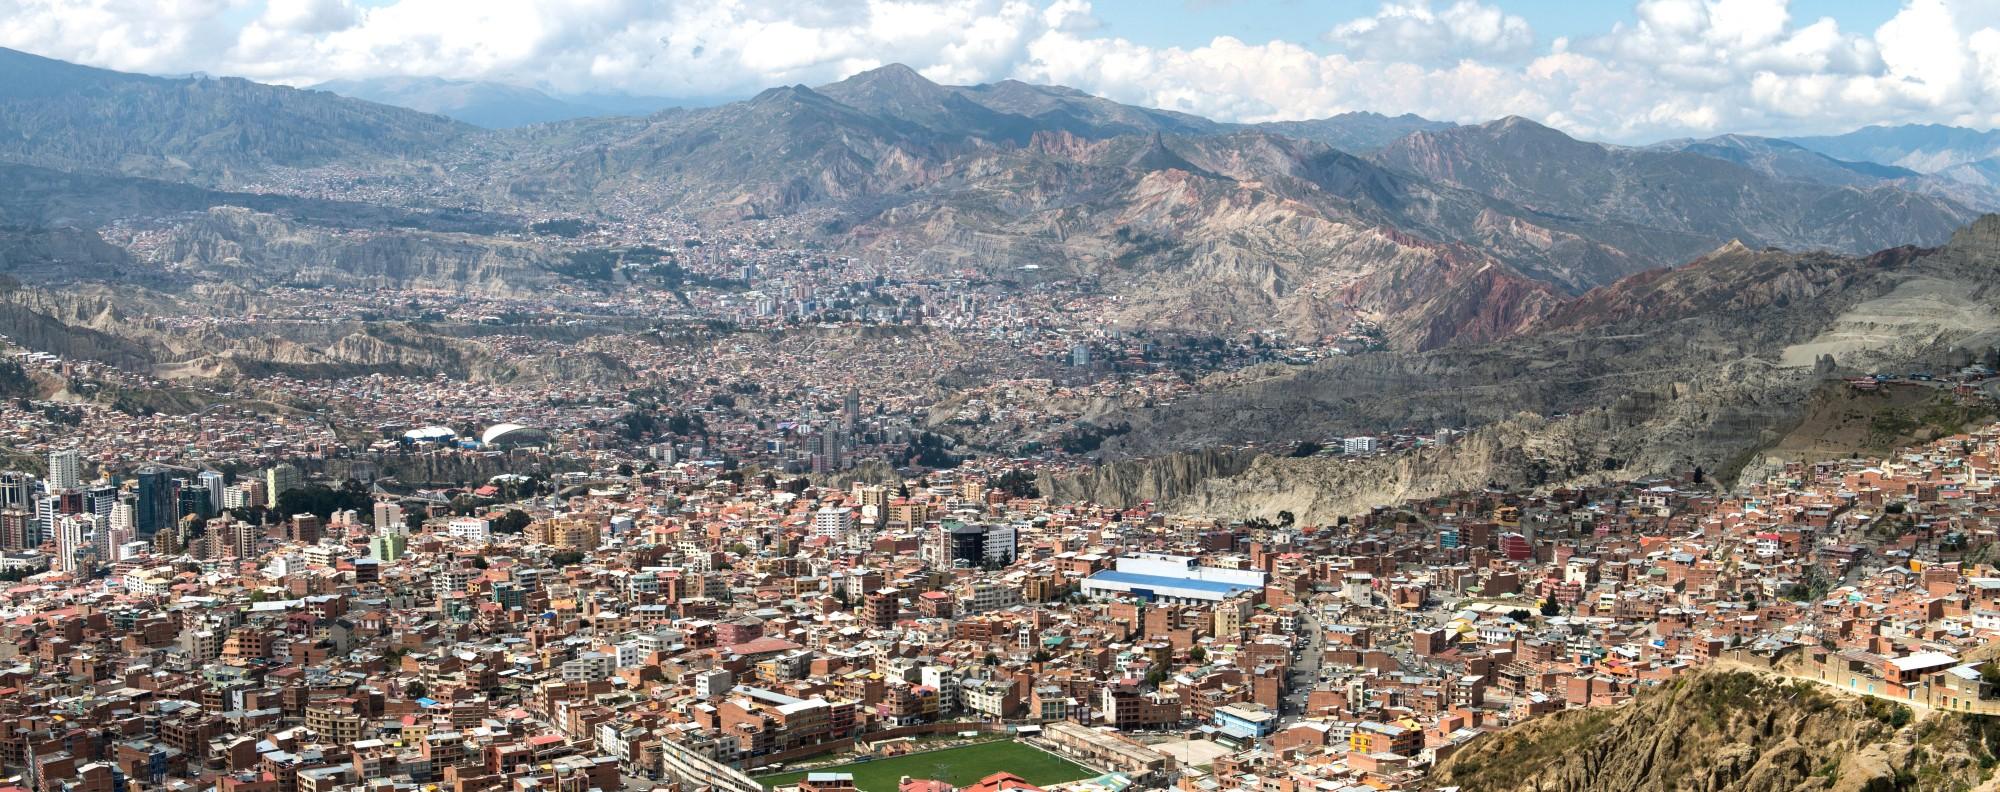 La Paz, Bolivia, – the world's highest capital city. Picture: Alamy